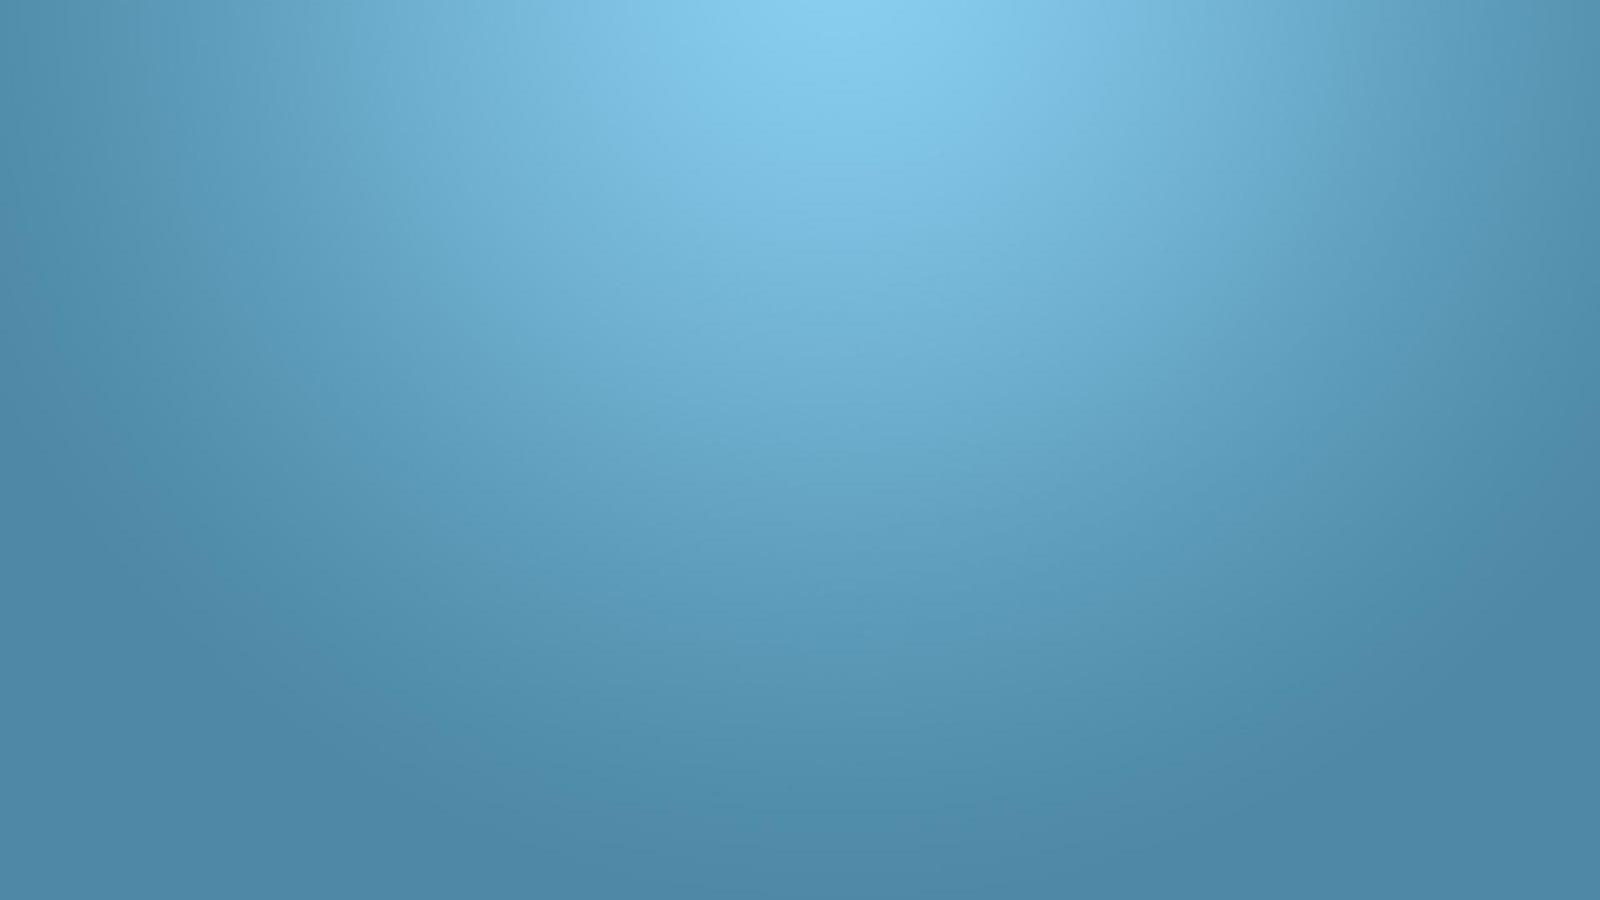 Baby Blue Windows 7 Desktop Wallpaper Baby Blue Wallpapers 1600x900